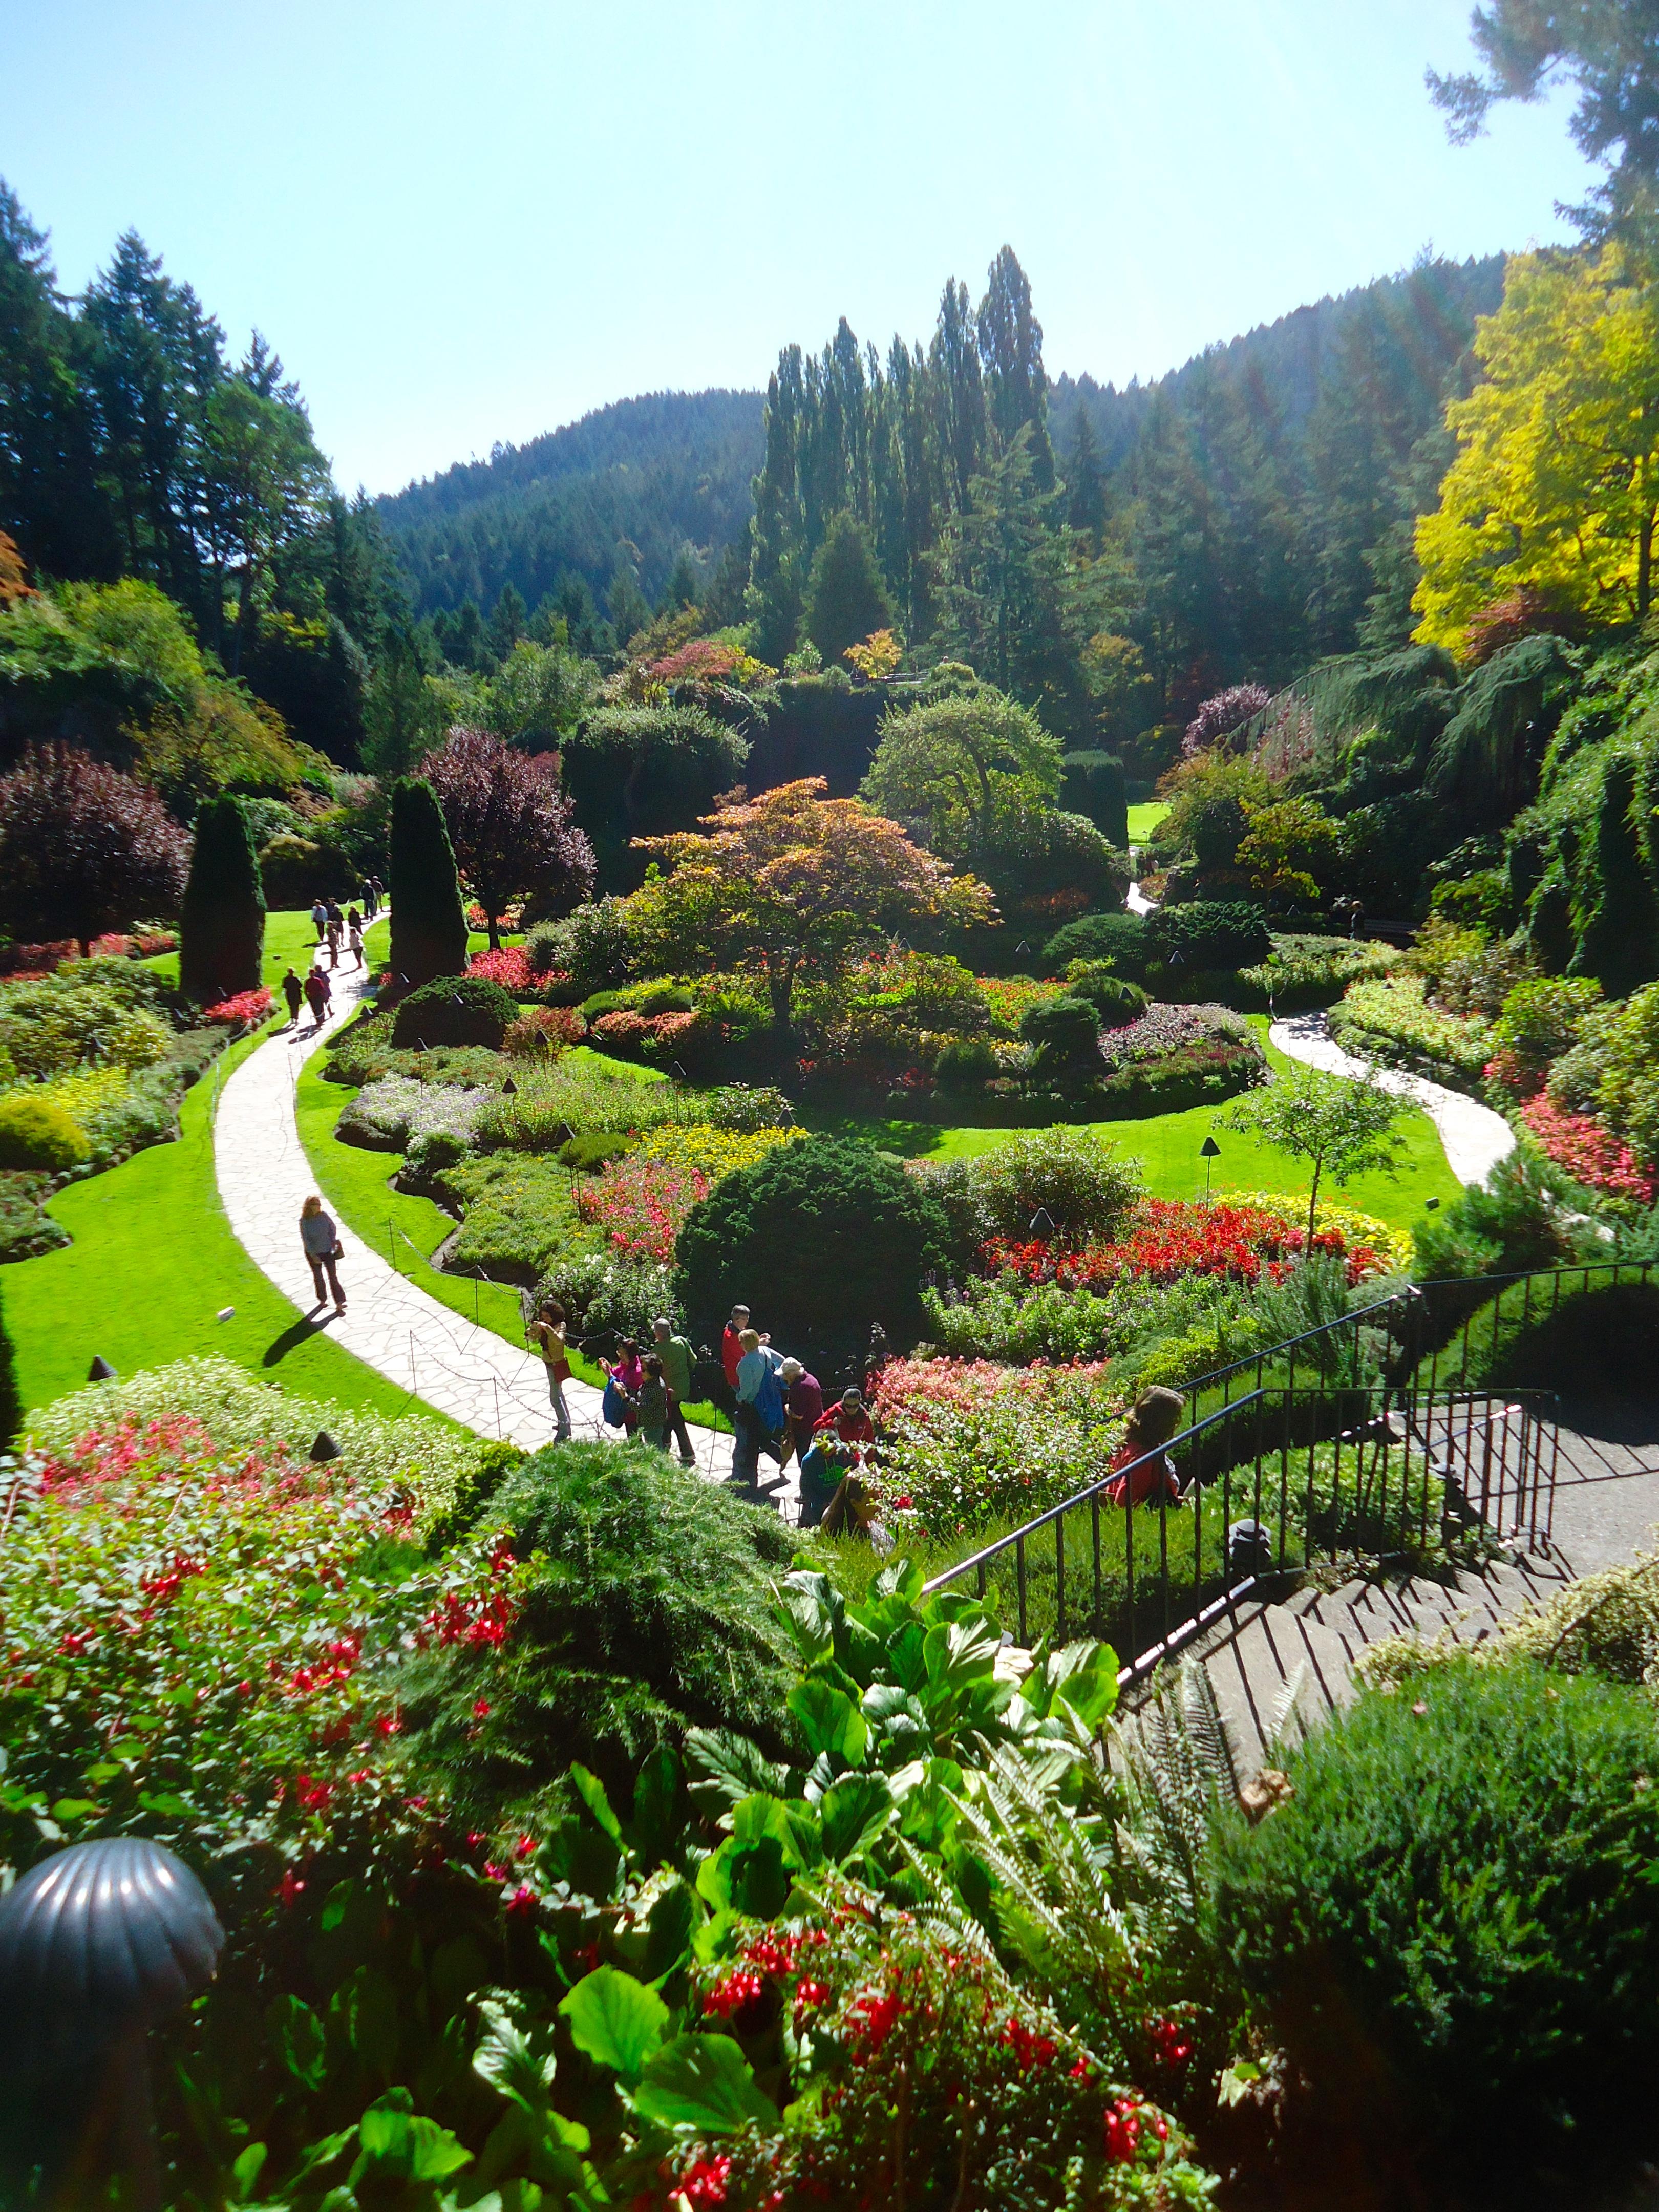 Ornamental Grasses Victoria Bc : September that bloomin garden